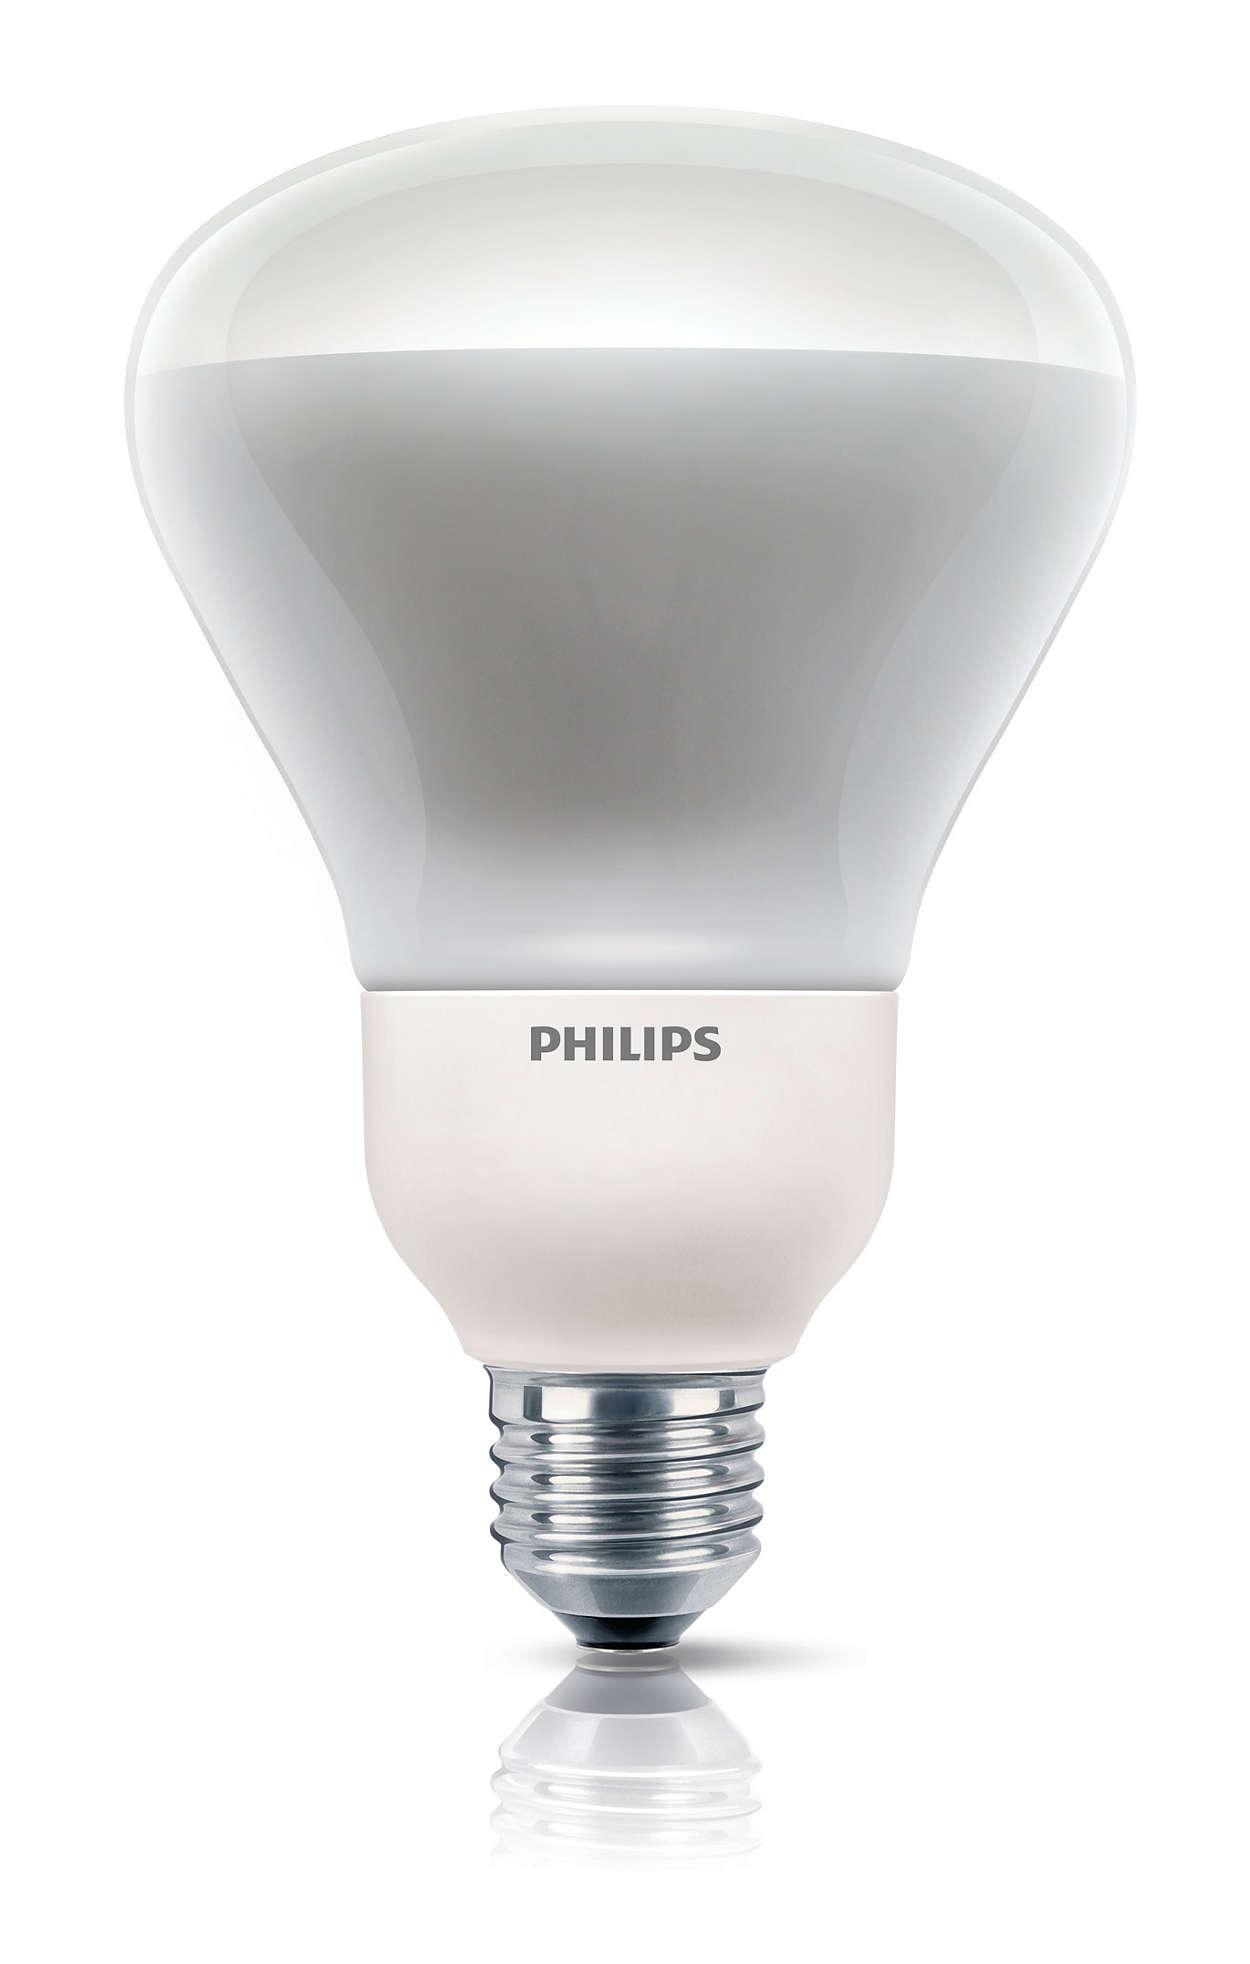 Energibesparende fra start